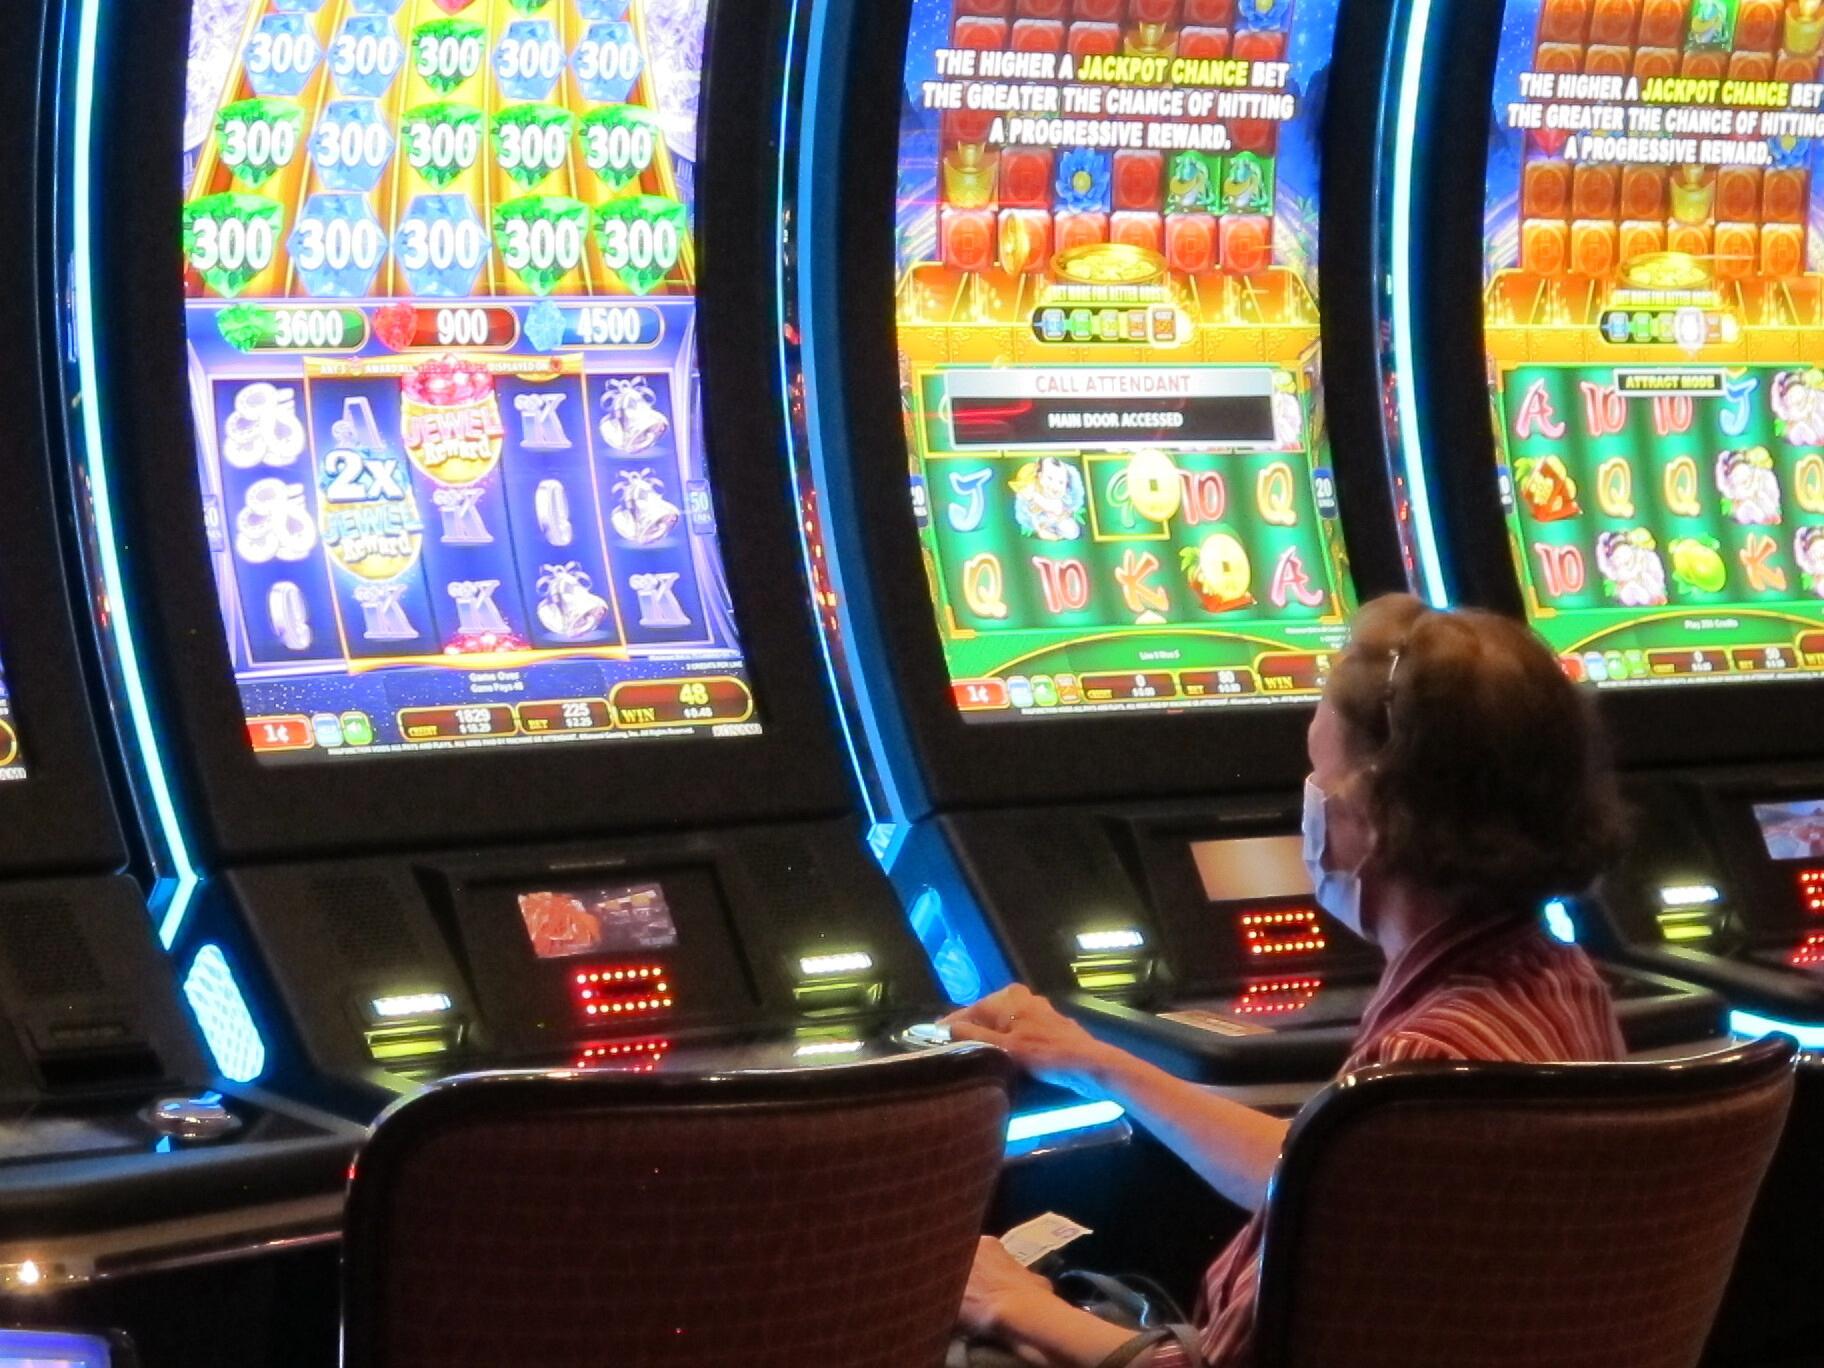 Hyundai casino washington online gambling felony repeal